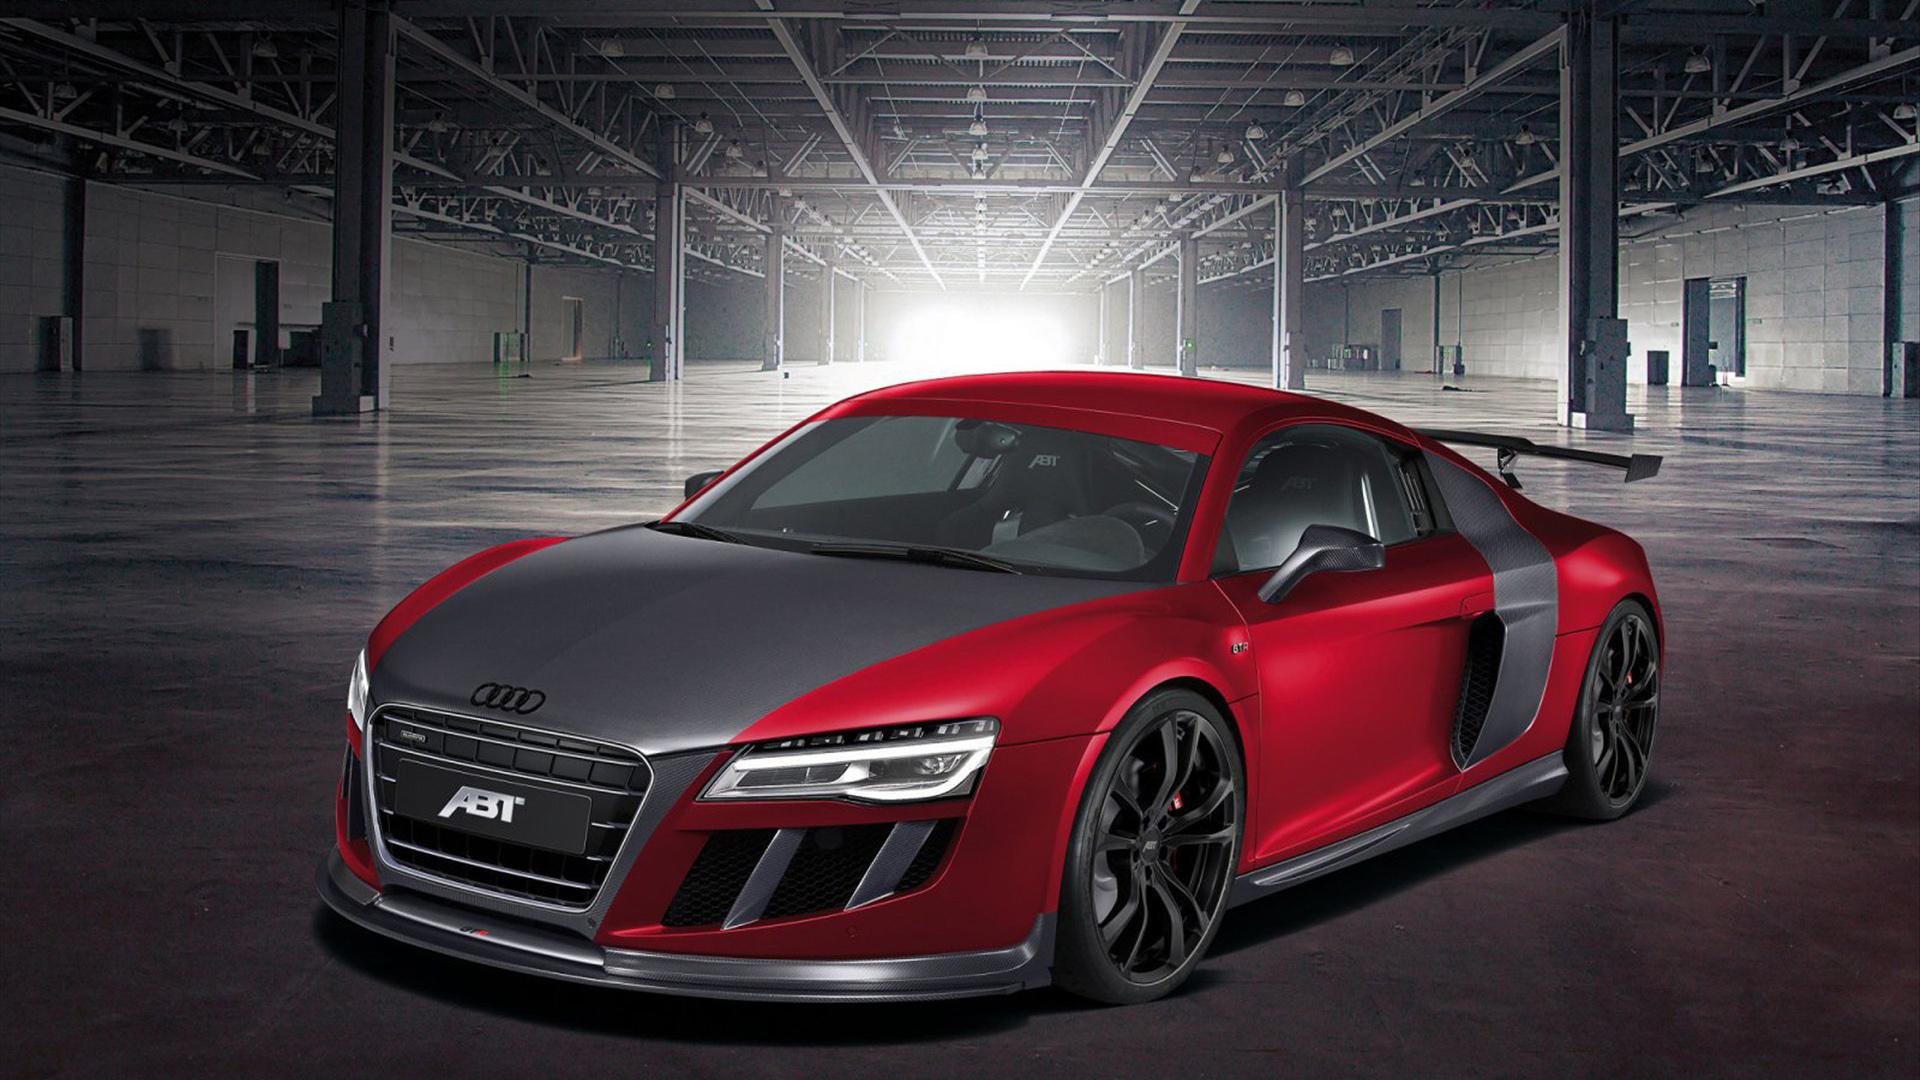 Audi R8 Black Red Image 4